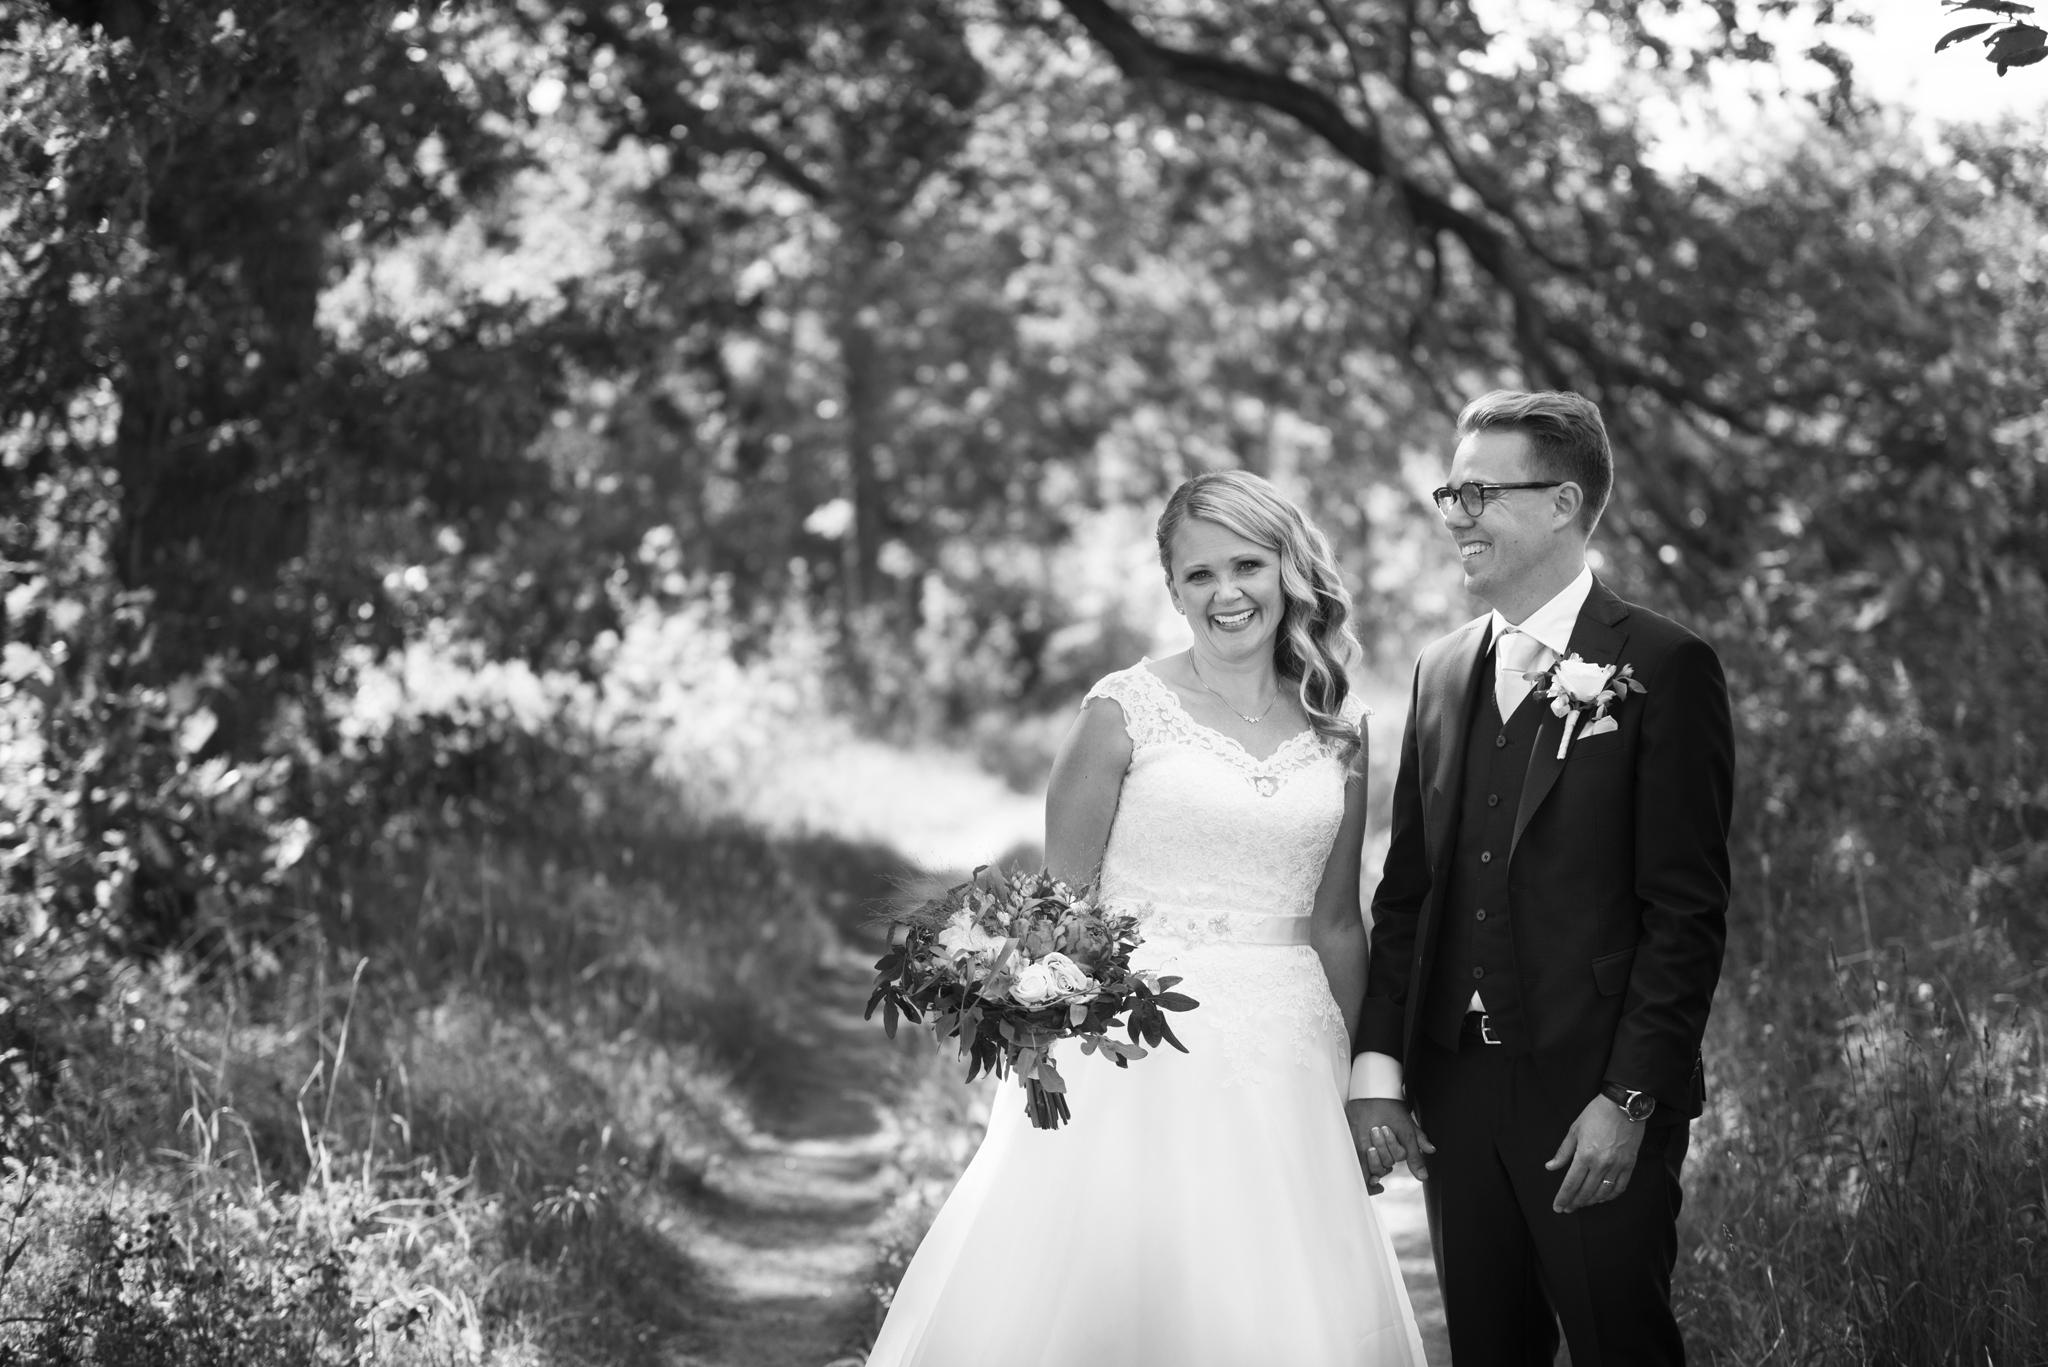 Kristina&Marcus_FotografPiaGyllin321 kopiera.jpg